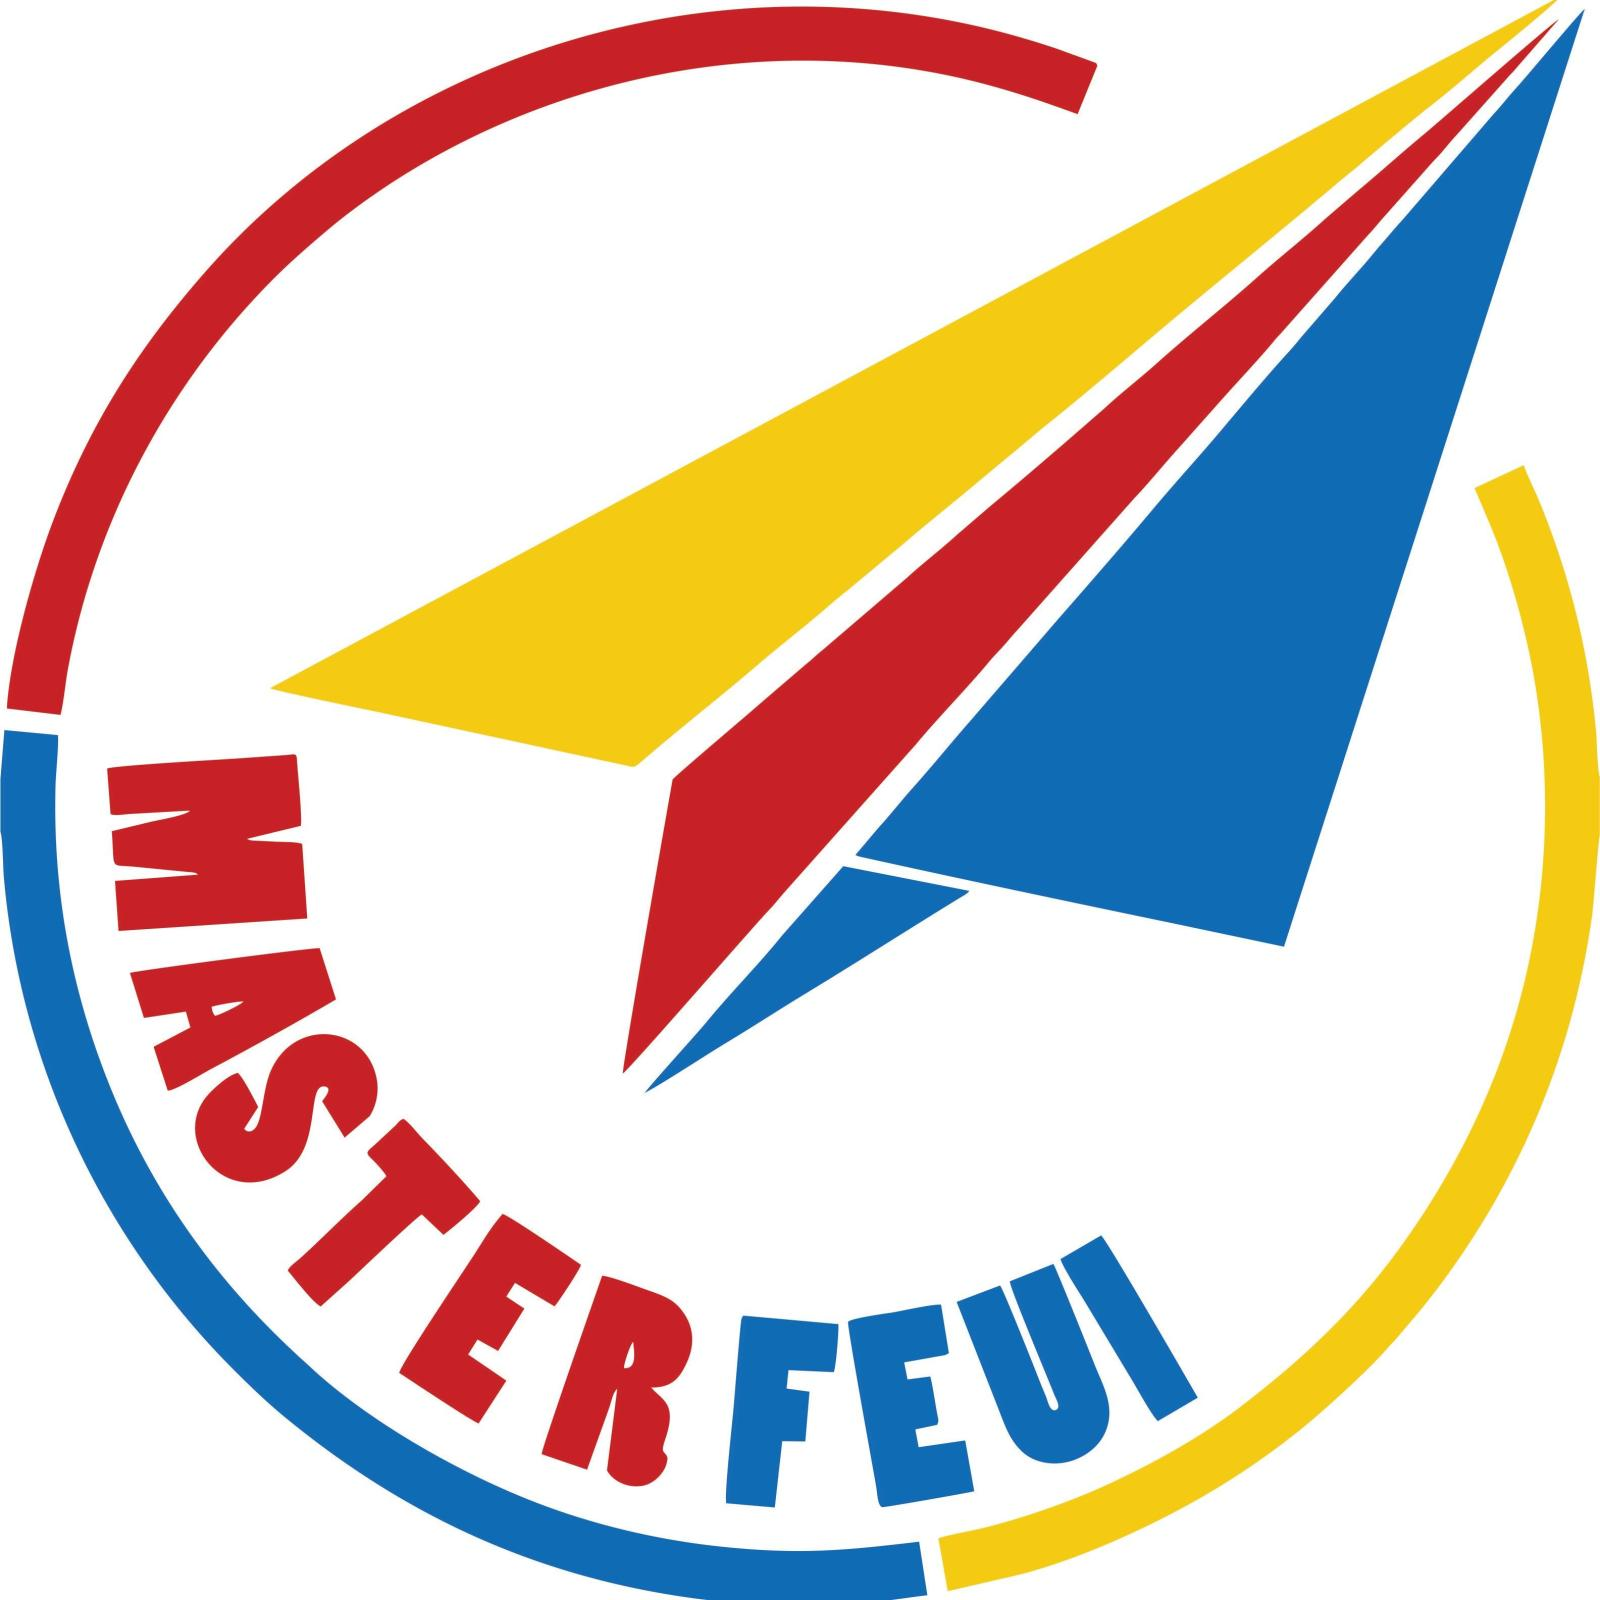 MASTER-FEUI | YABIM DEPOK | SEKOLAH MASTER